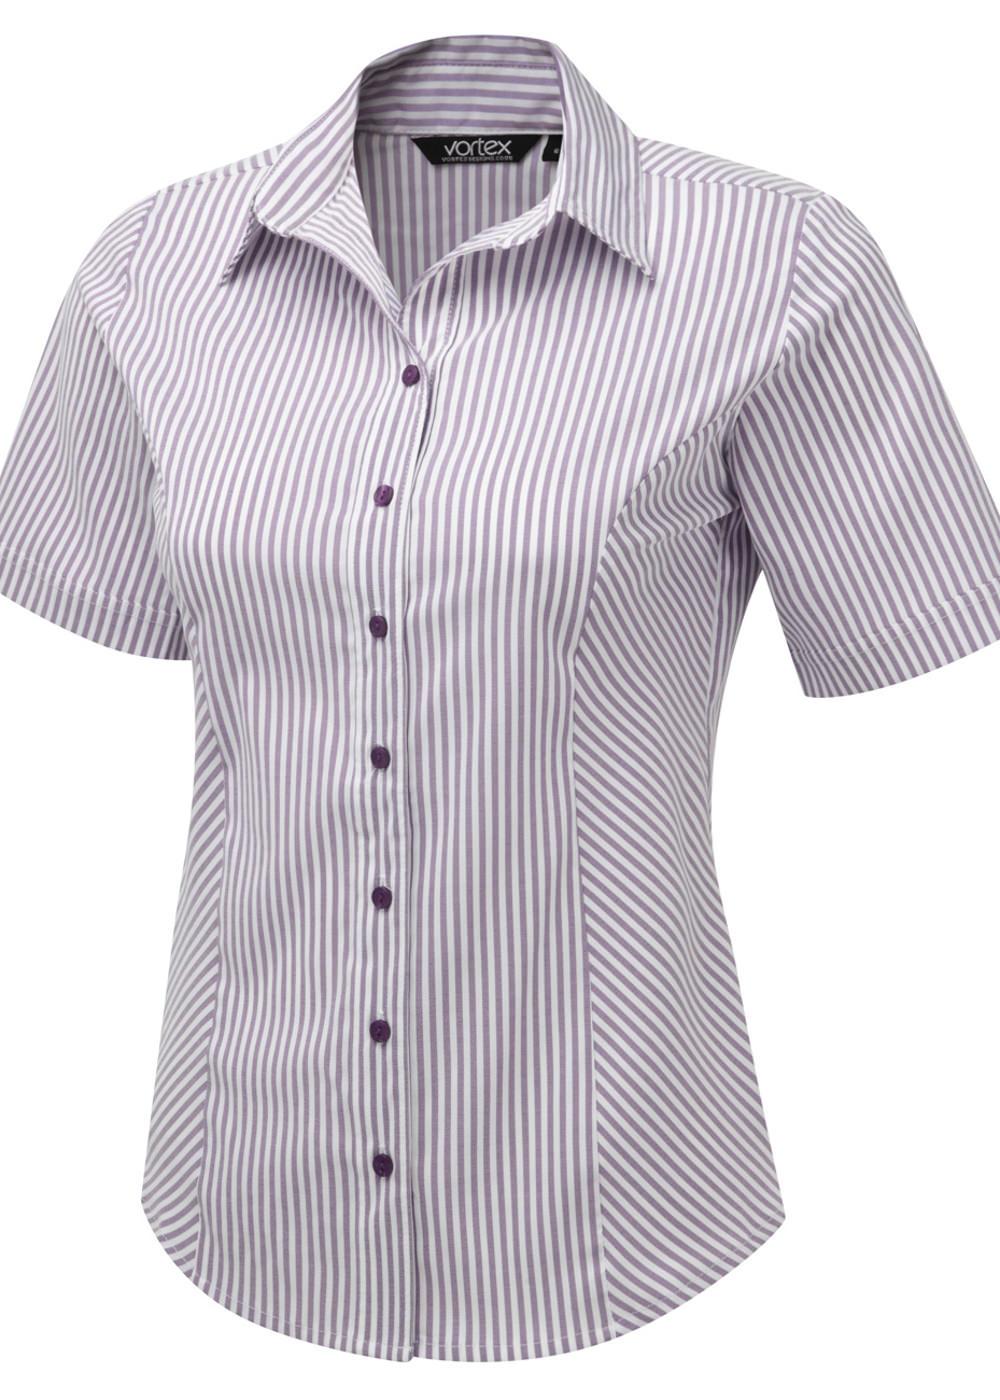 ANNIKA SS - Cotton Touch stretch blouse